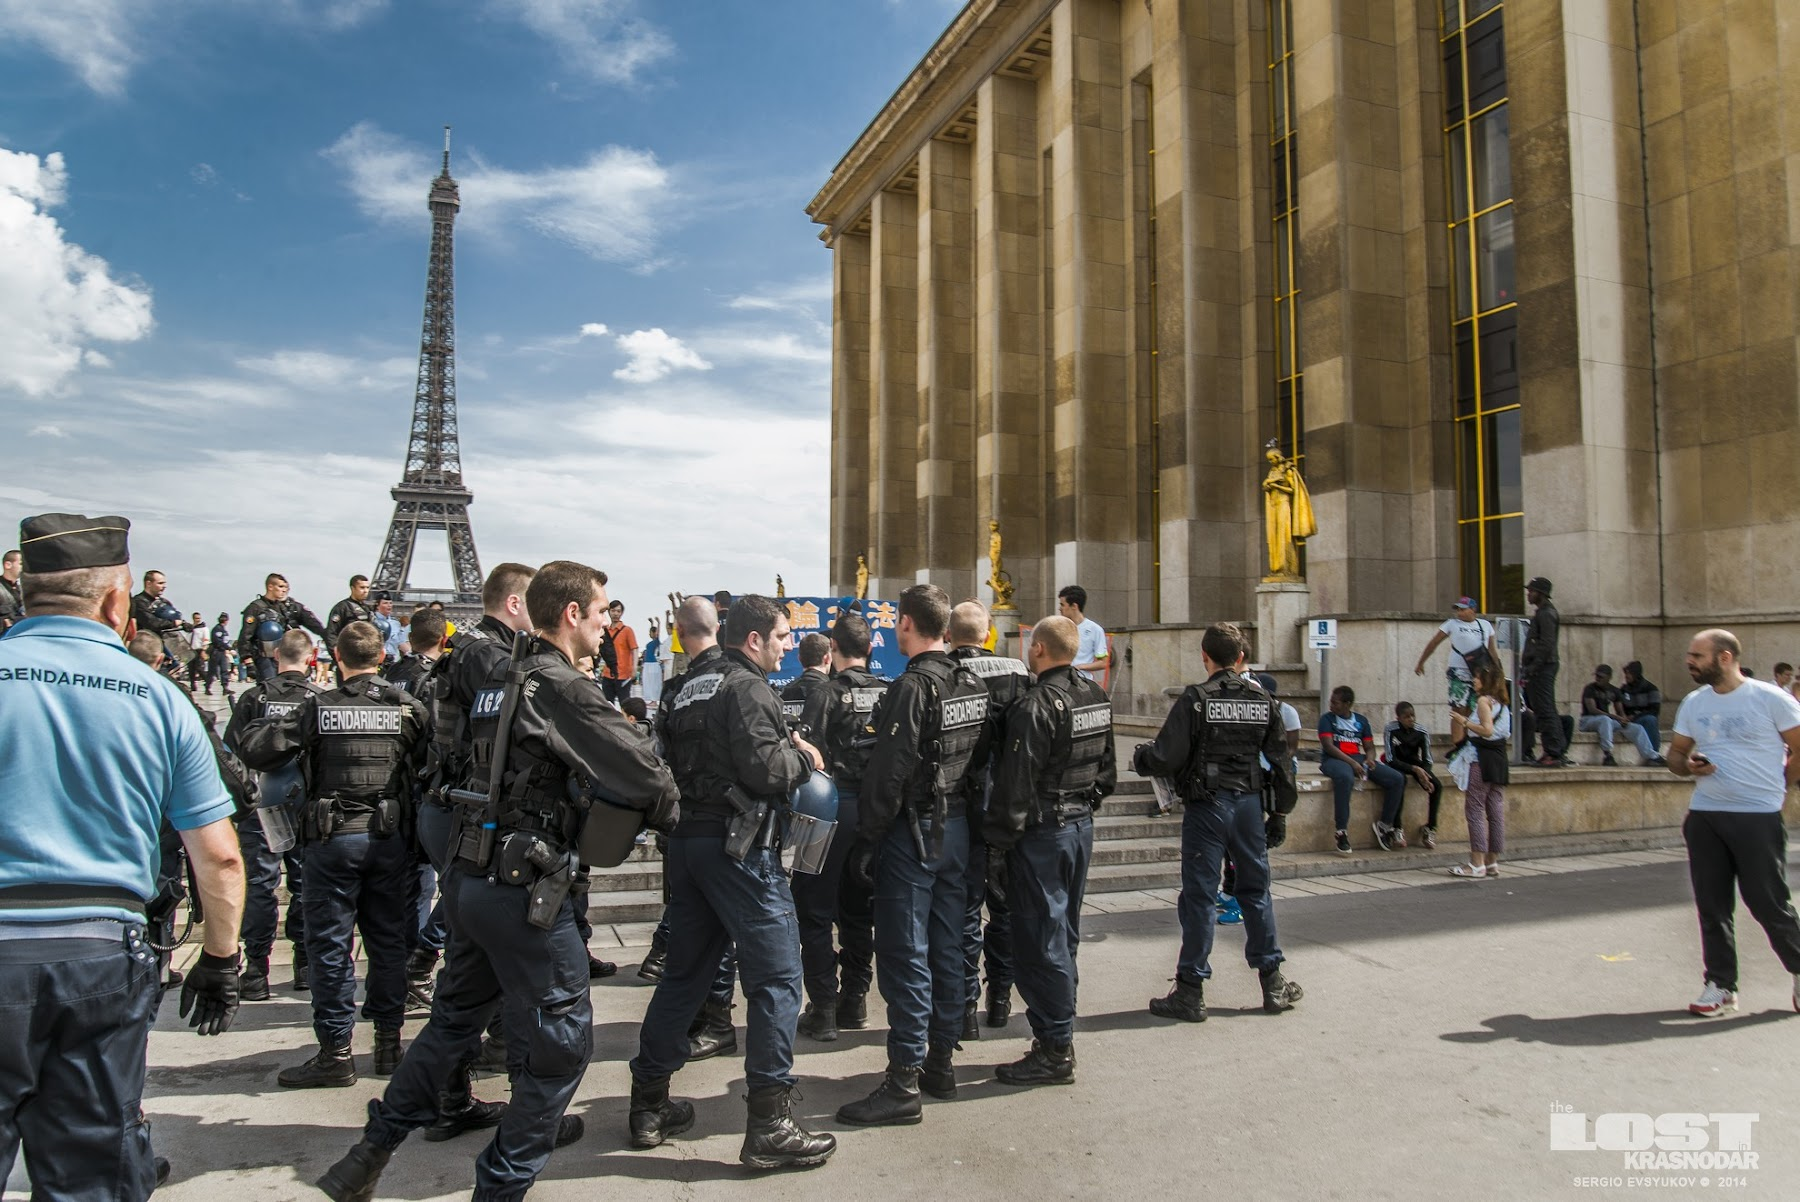 Cordon of gendarmes, pro-Palestinian protest